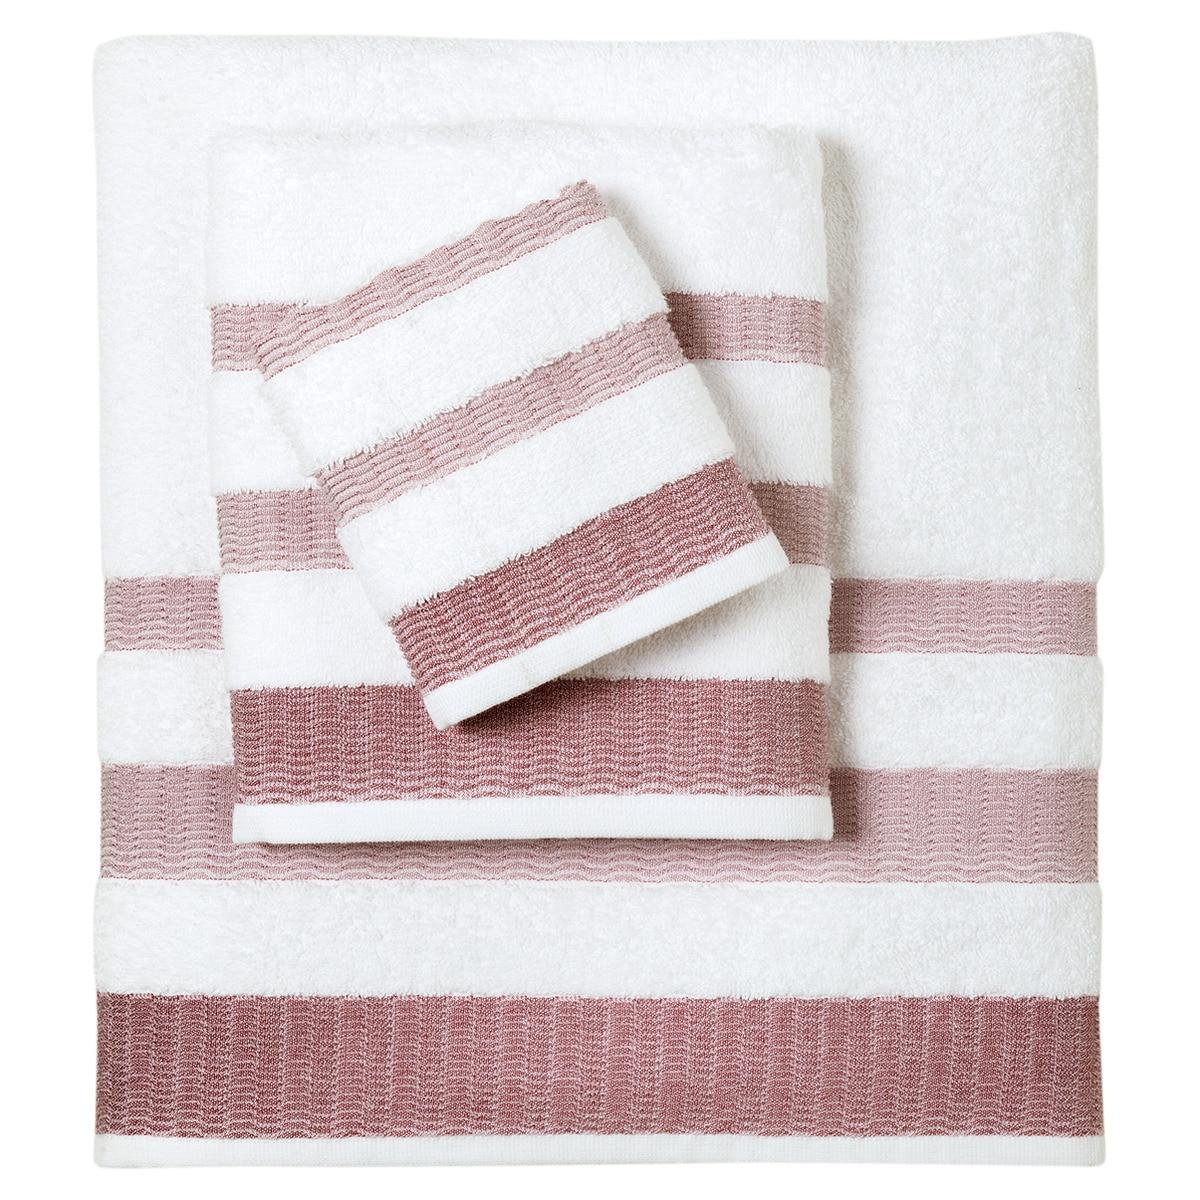 Dalini-Pintuck-matching-towel